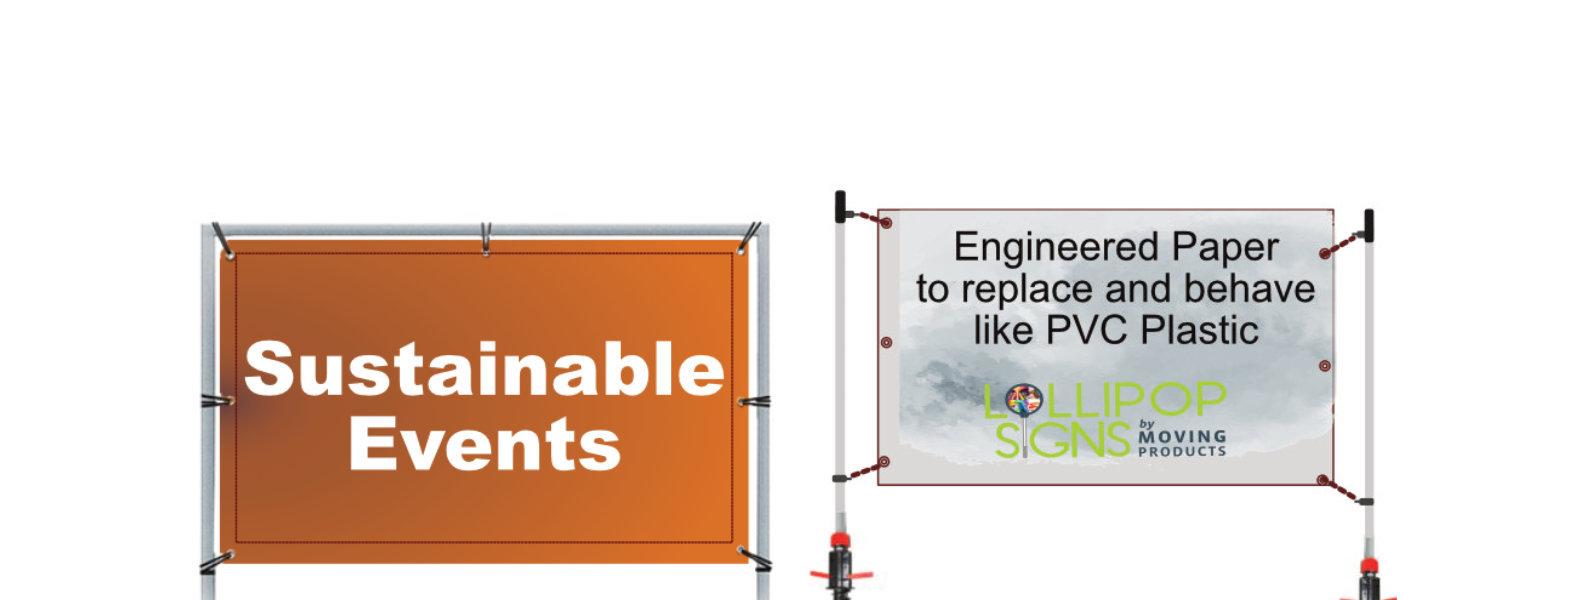 PVC-Free Banners